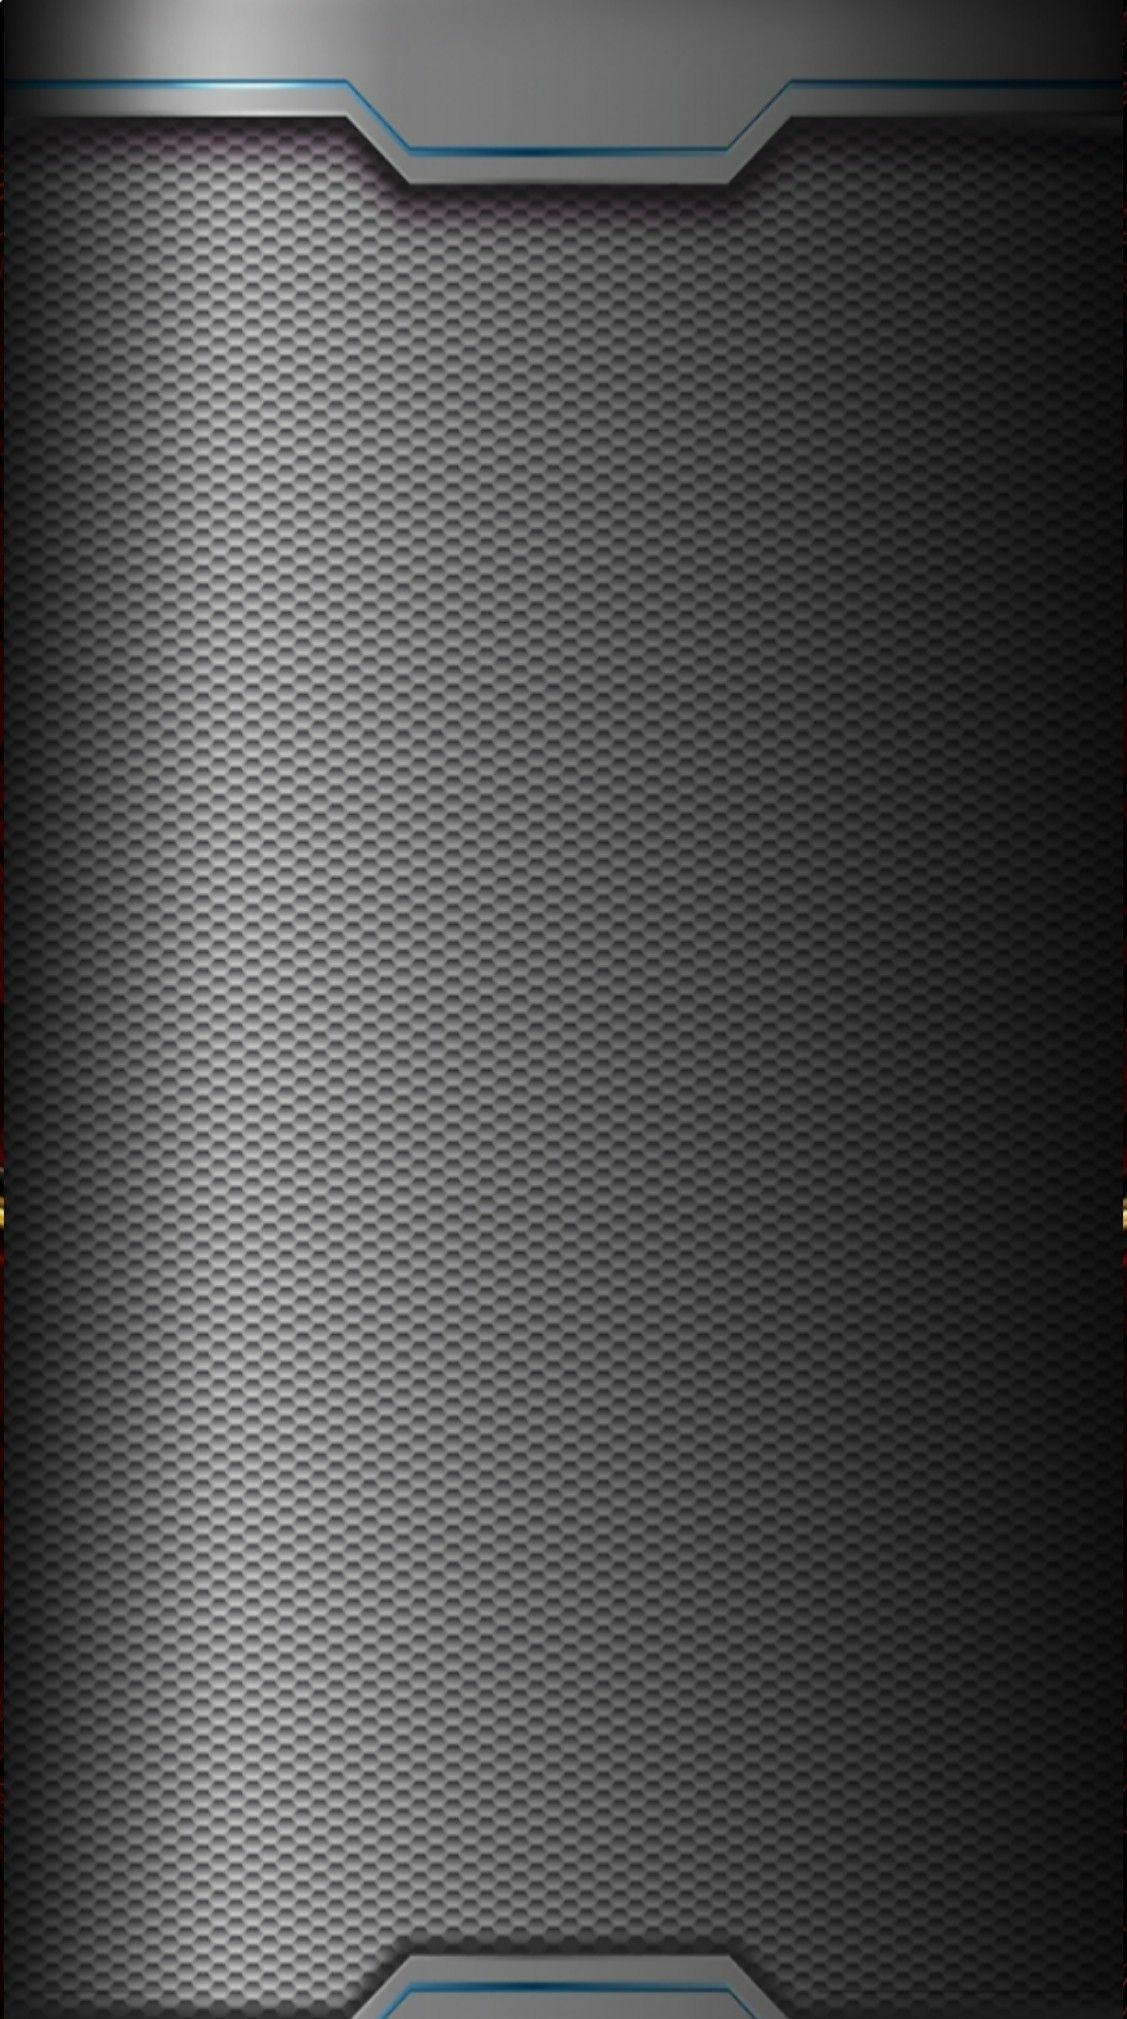 Gray Metallic Wallpapers Top Free Gray Metallic Backgrounds